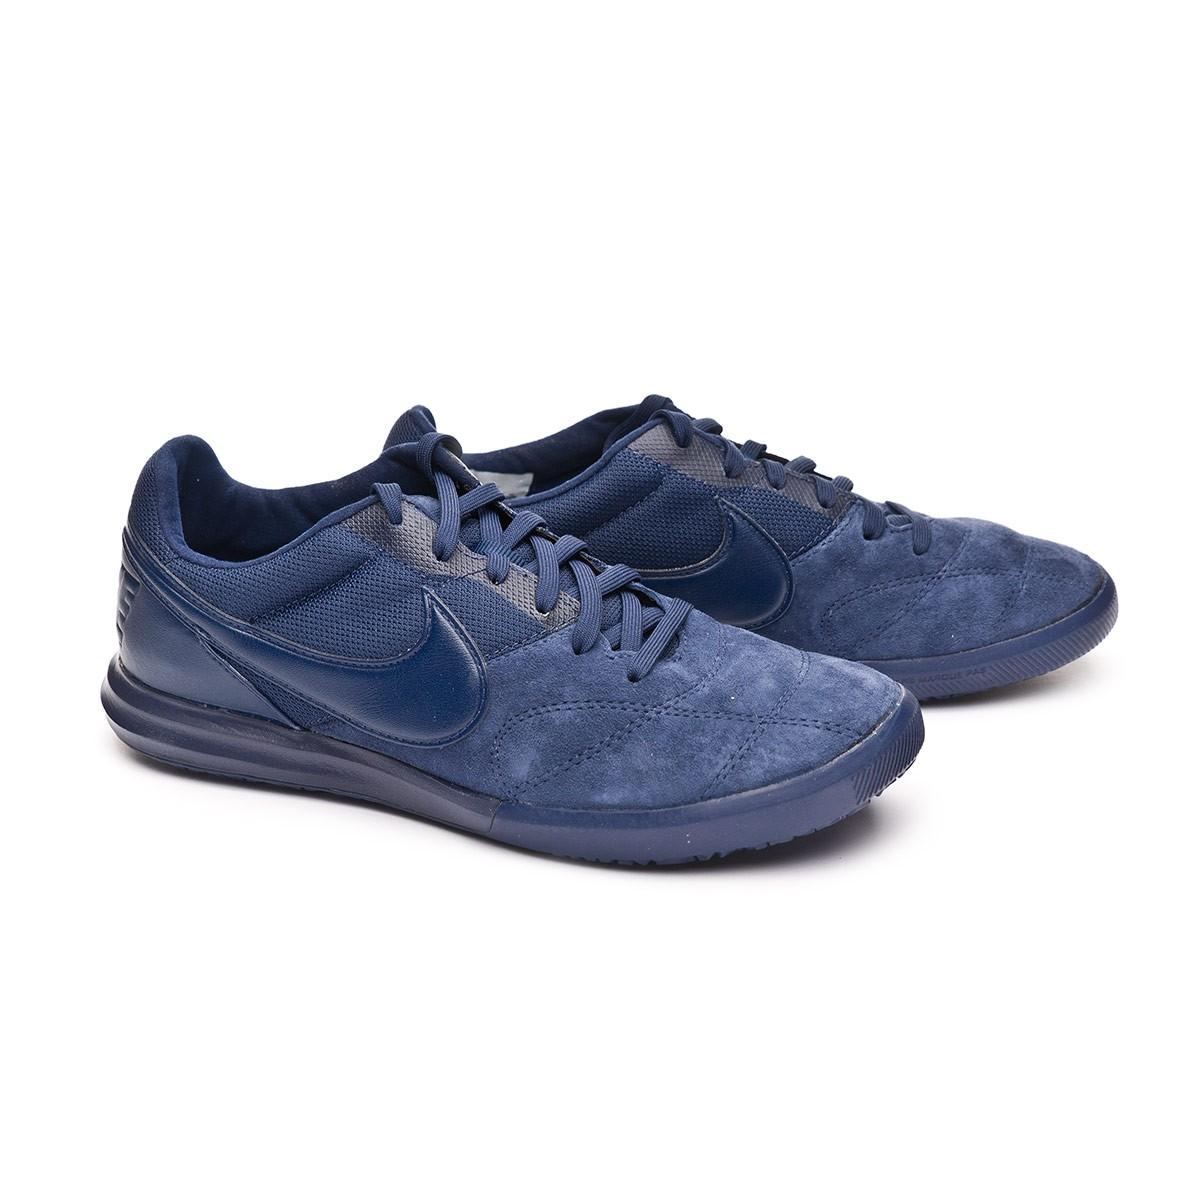 Scarpe Nike Tiempo Premier II Sala IC Midnigt navy-White - Negozio